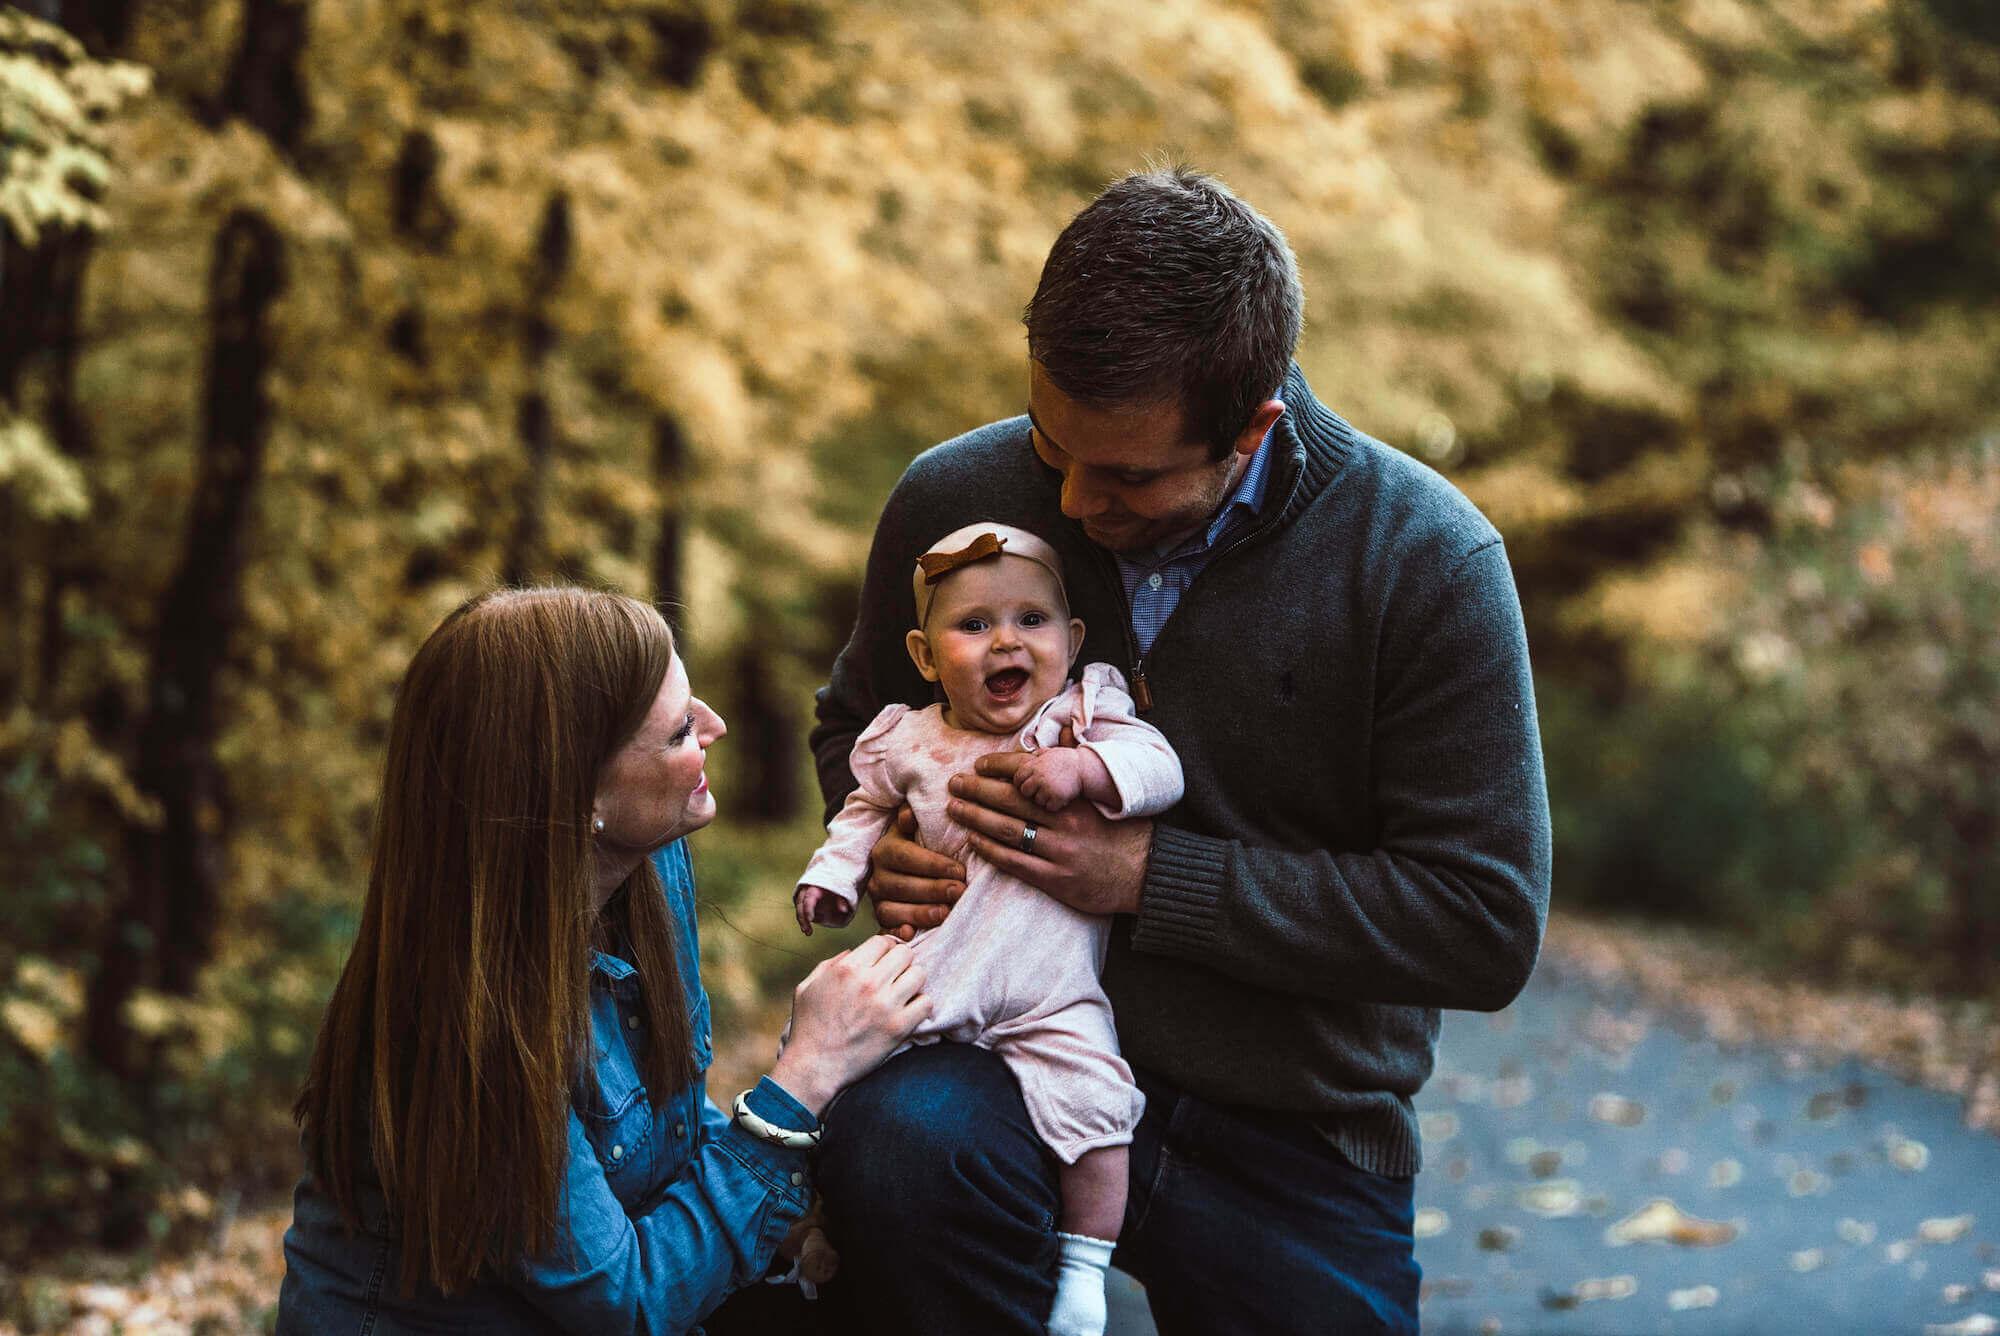 engle-olson-family-photography-session-2.jpg